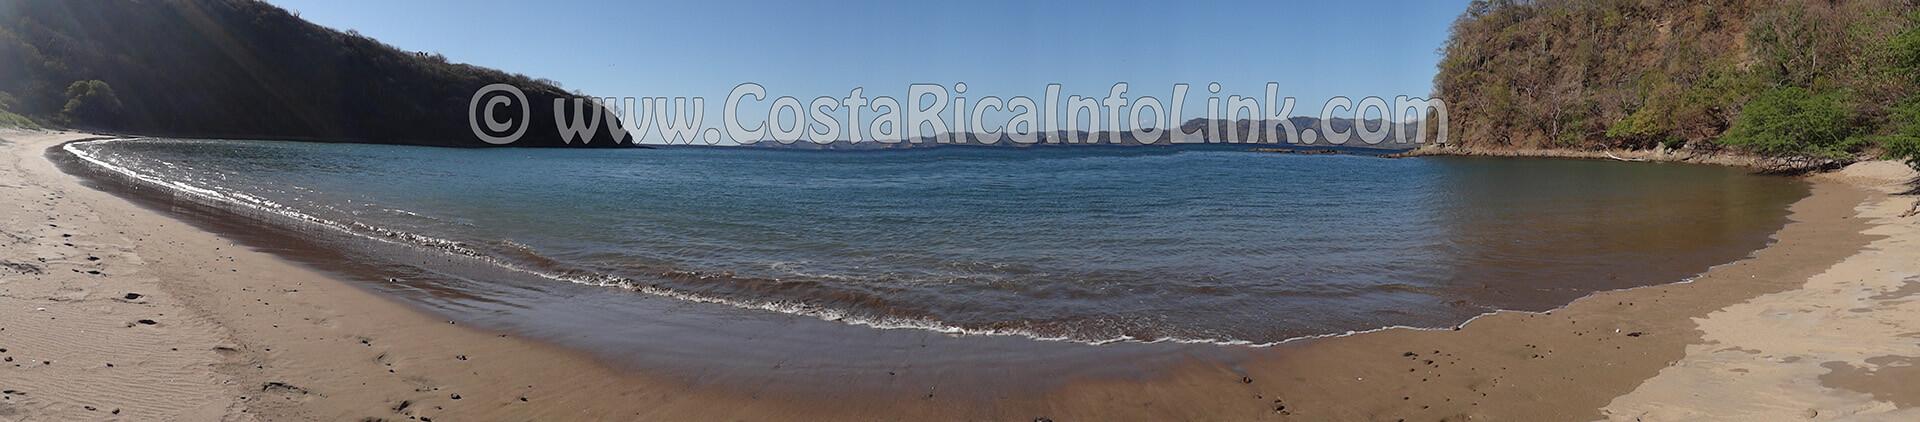 Jobo Beach Costa Rica